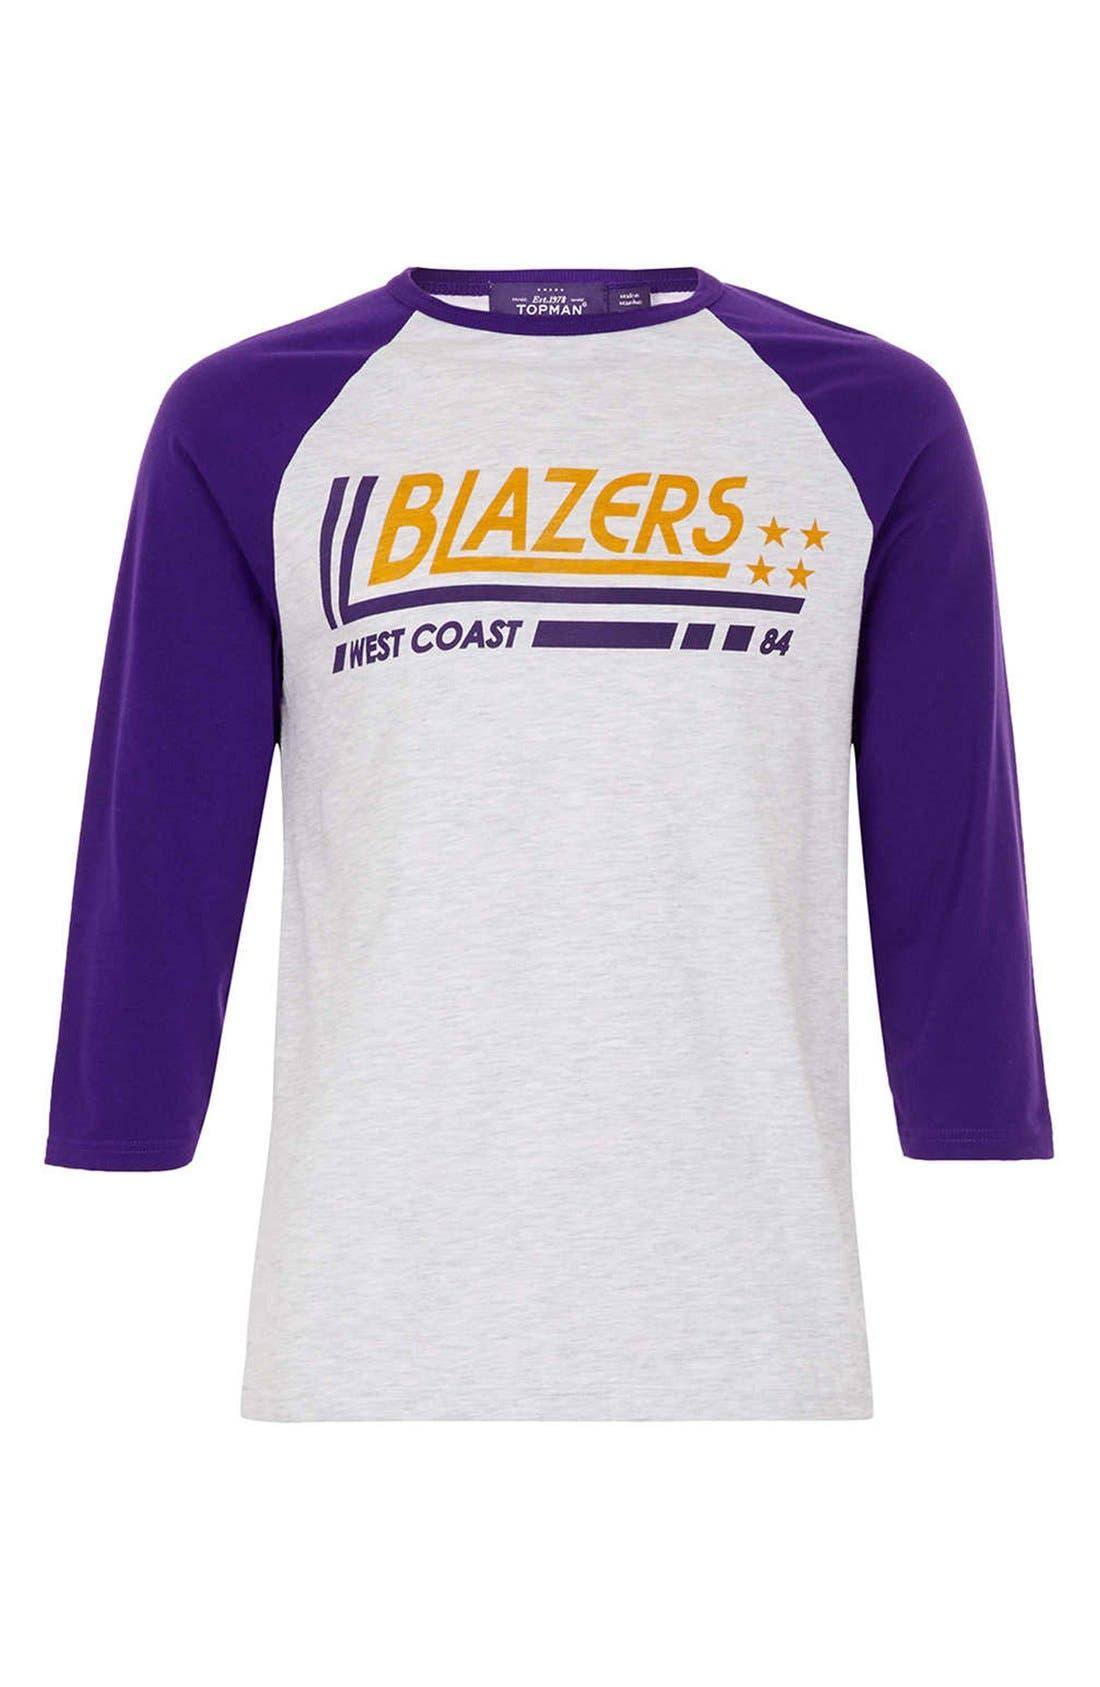 Alternate Image 1 Selected - Topman Blazers Baseball T-Shirt